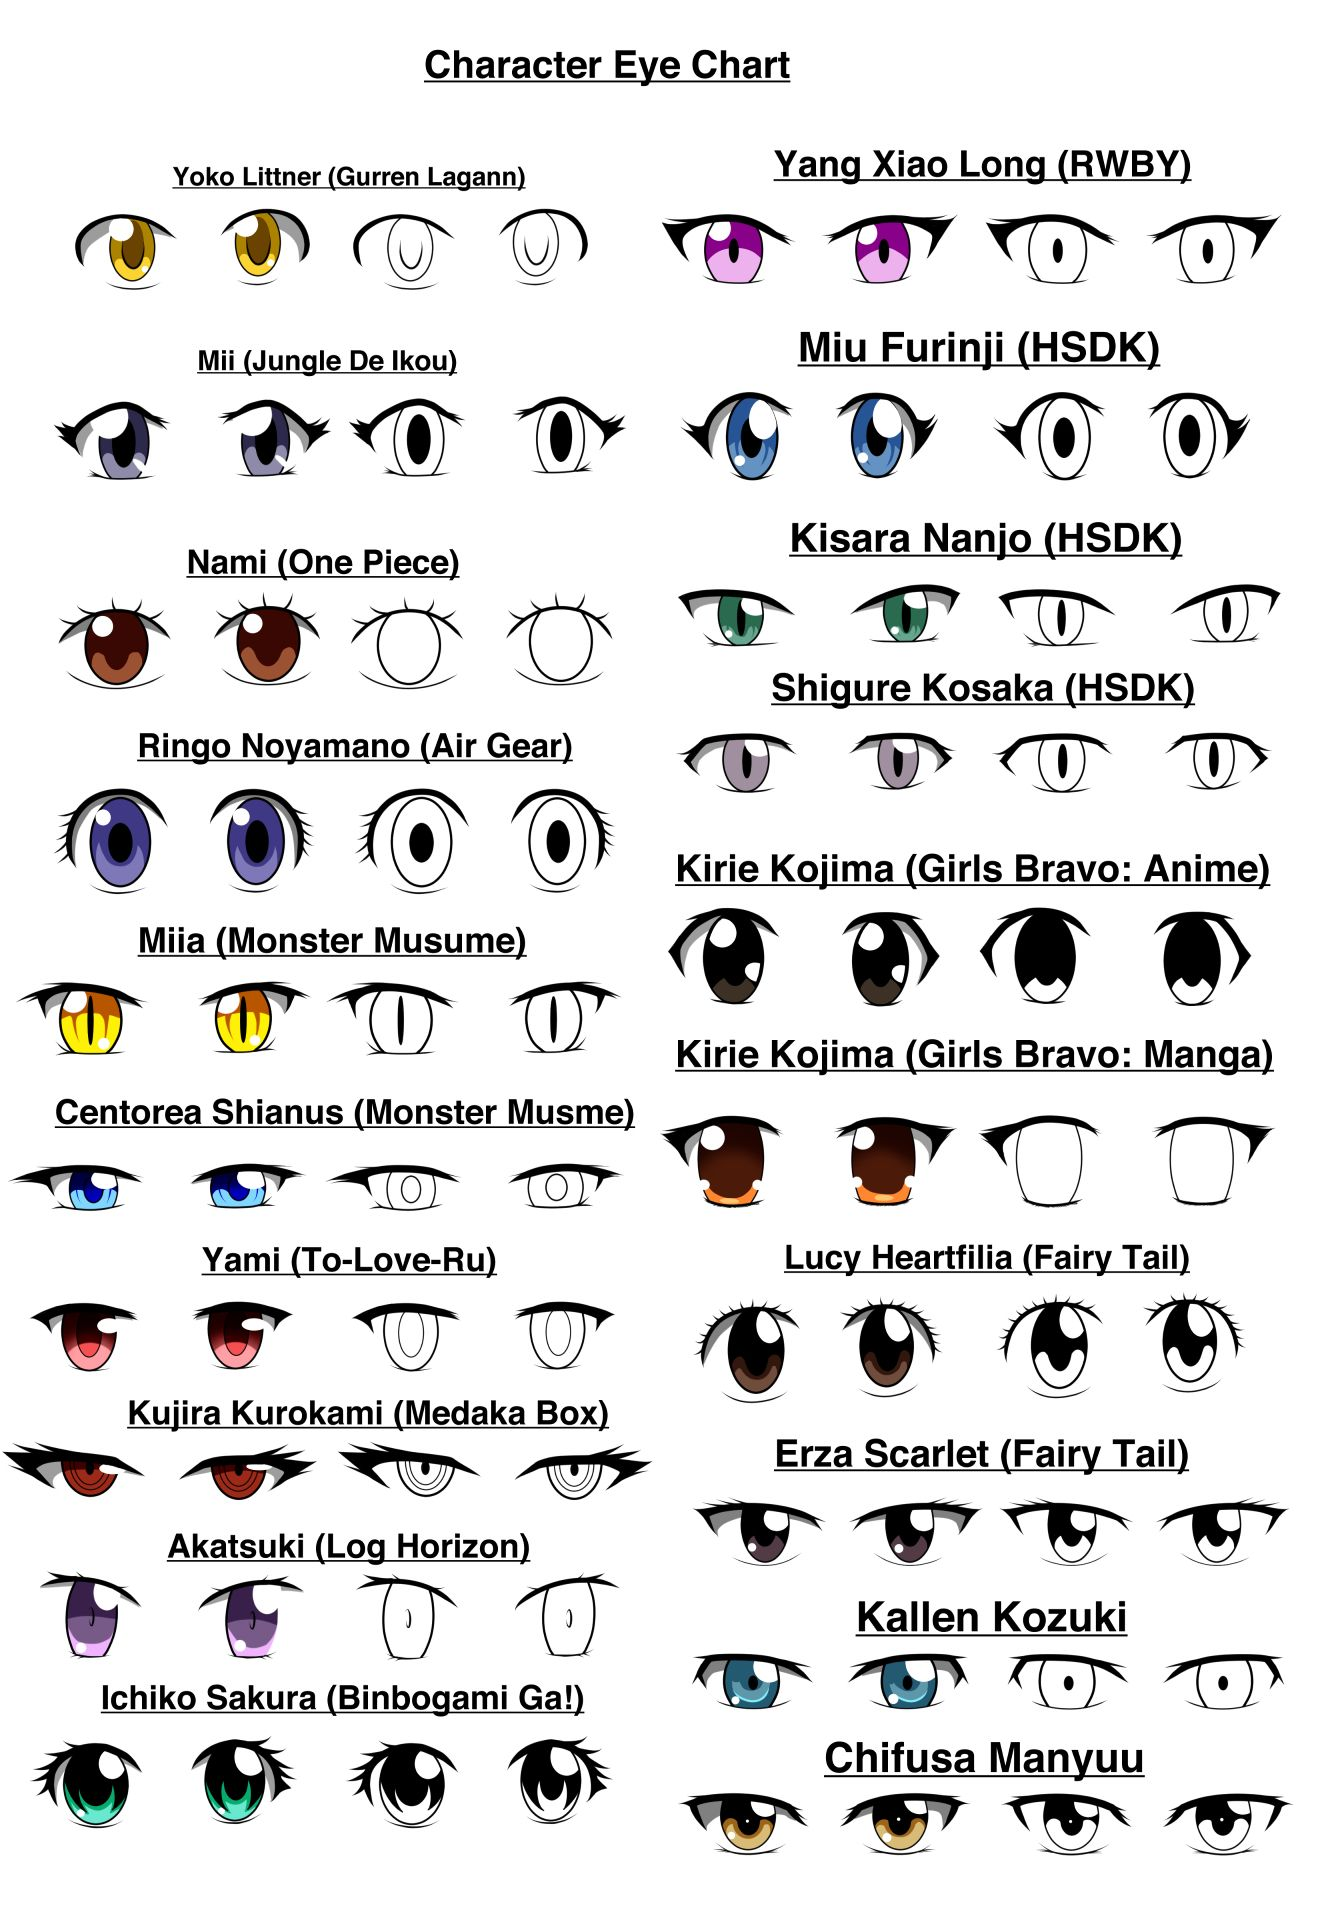 manga eyes styles Google Search Eye chart, Anime eyes